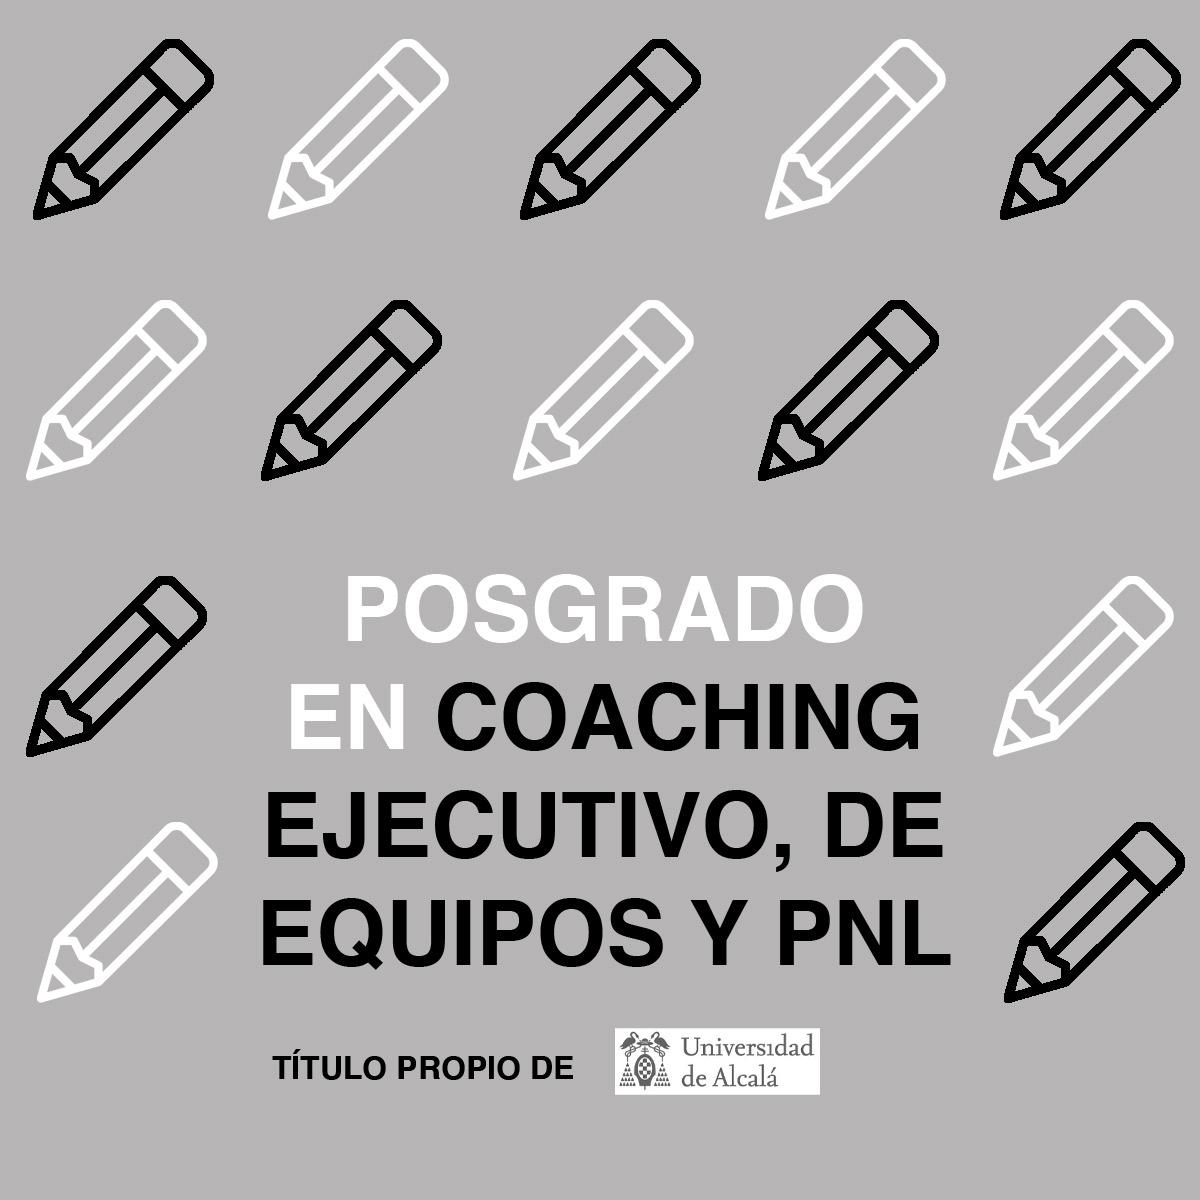 Aflora Consulting Posgrado experto coaching ejecutivo equipos pnl uah aflora consulting-formacion